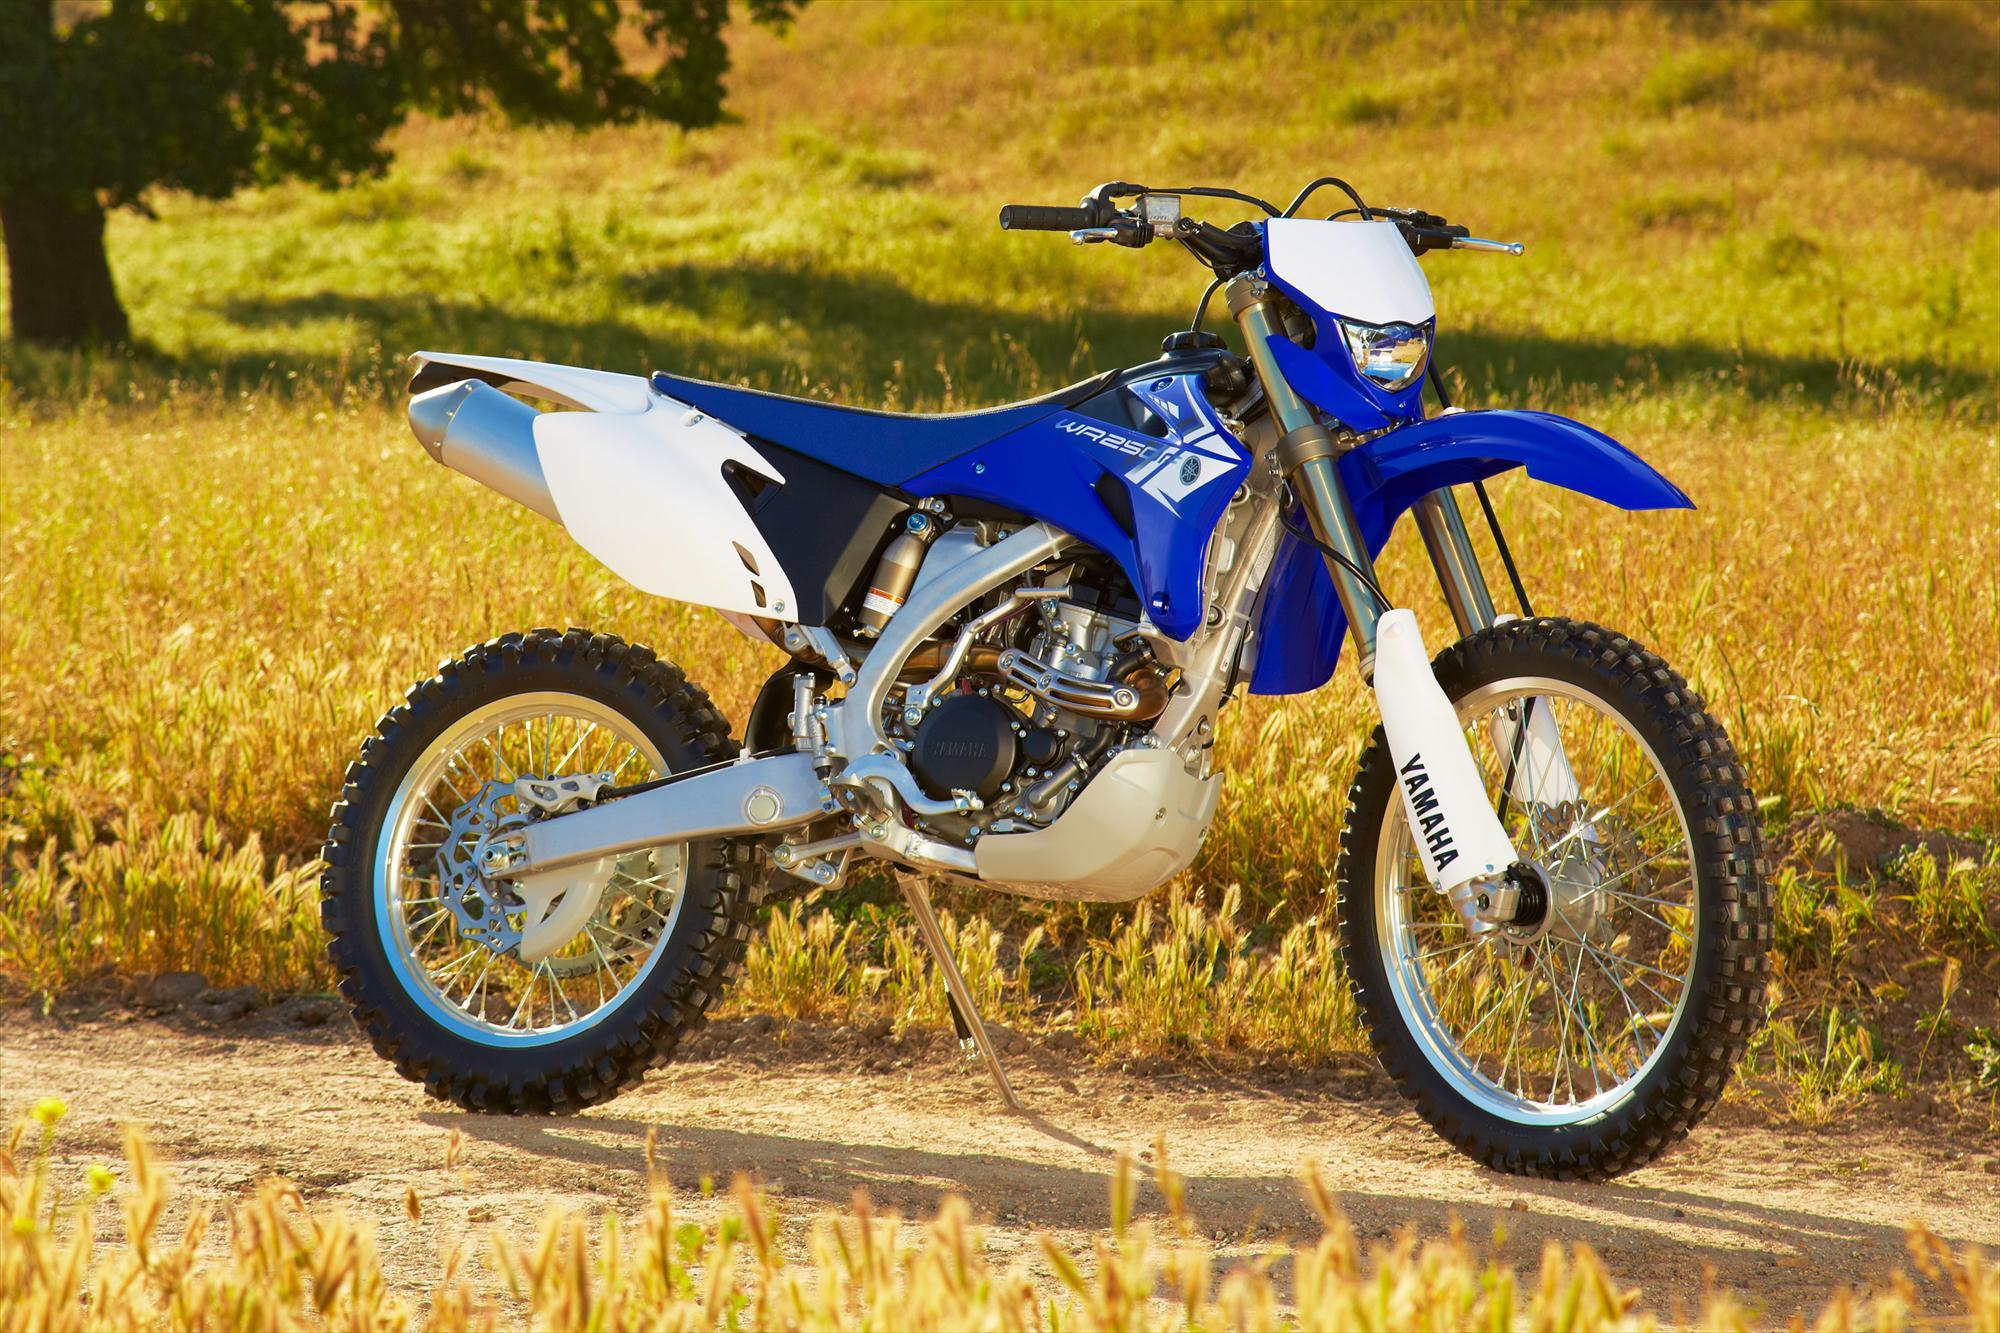 Yamaha Wrf Horsepower